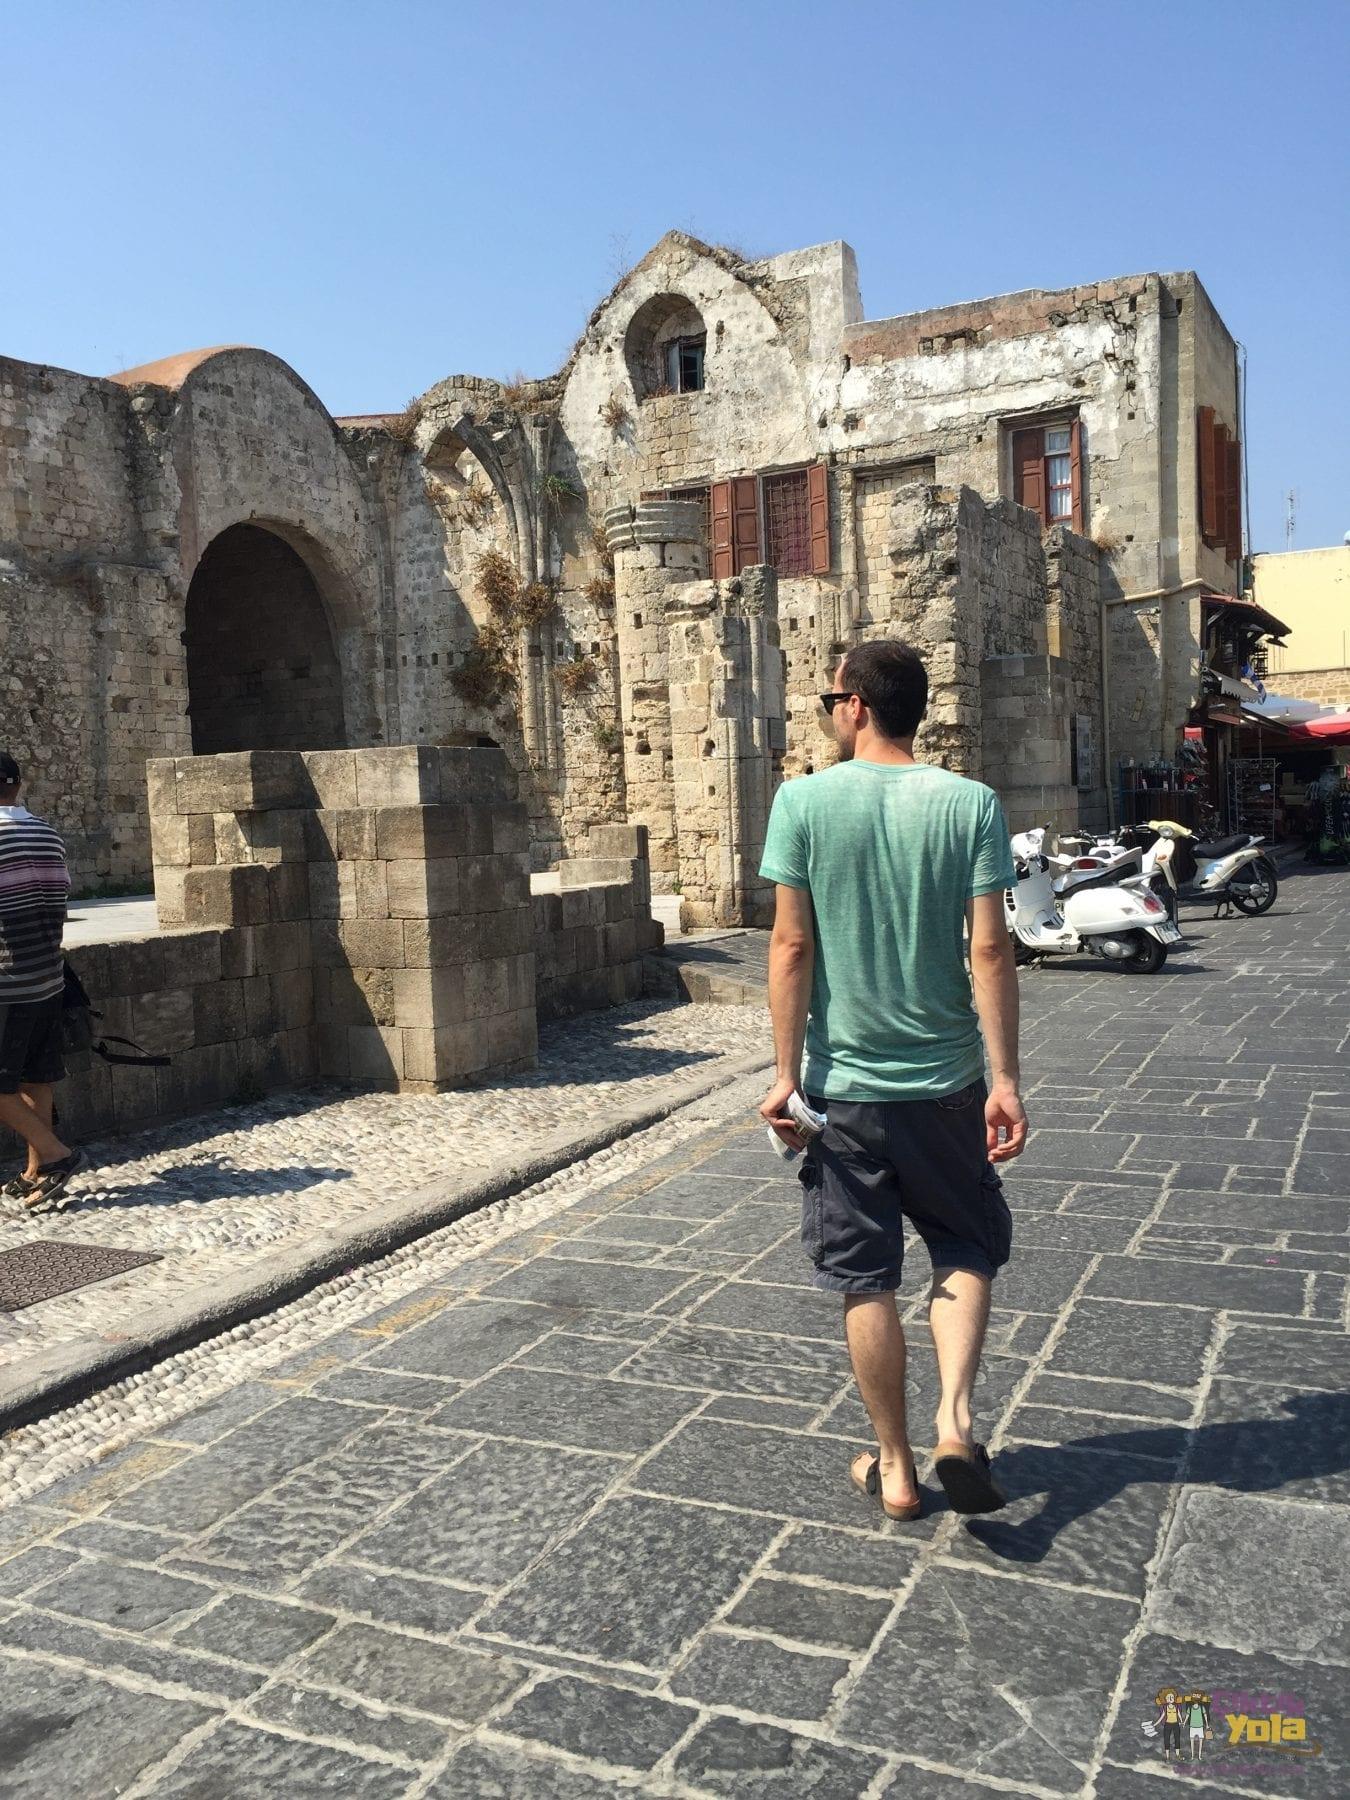 rodos antik şehir old city